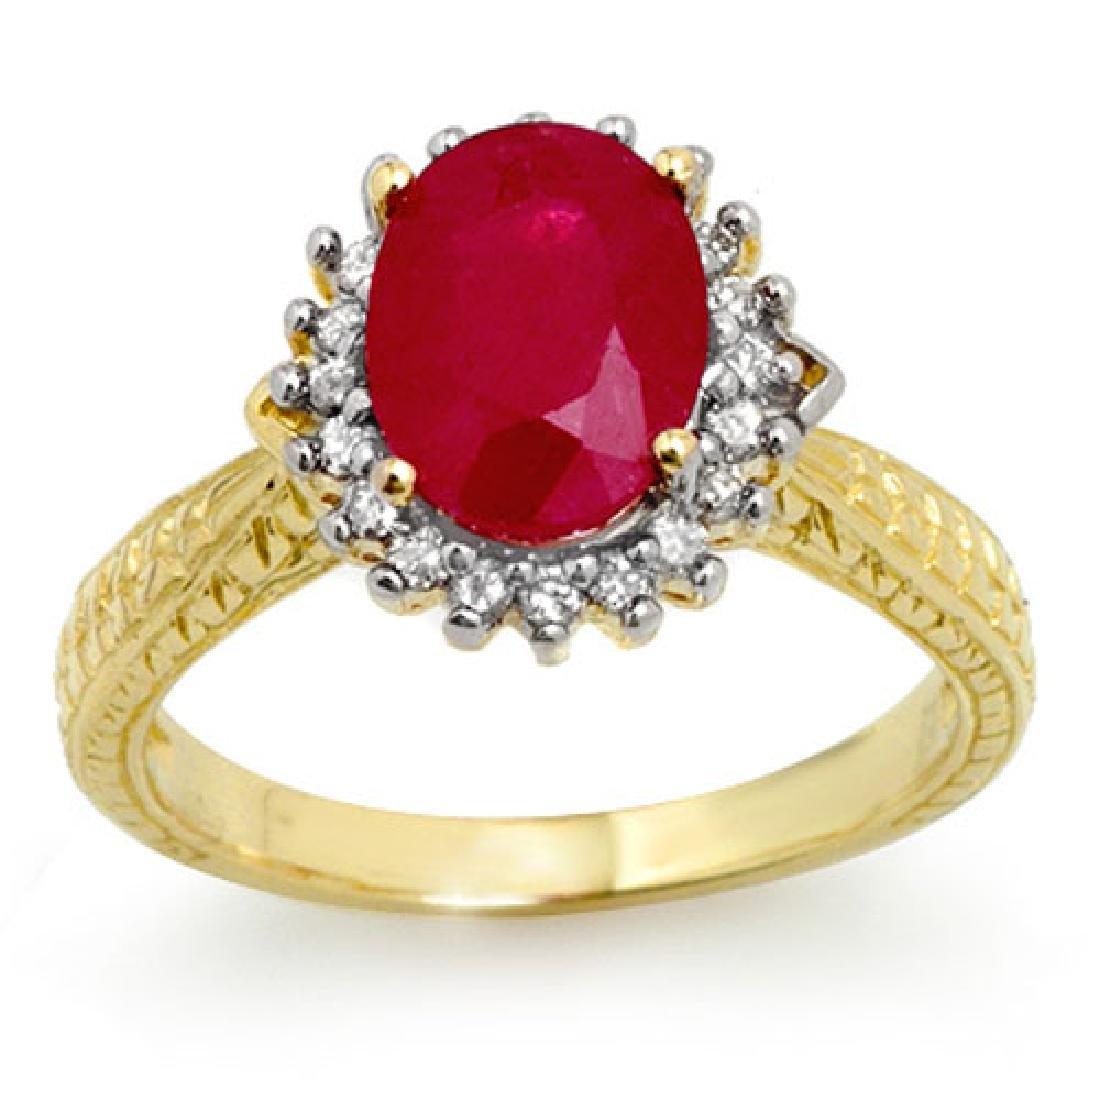 2.75 CTW Ruby & Diamond Ring 10K Yellow Gold